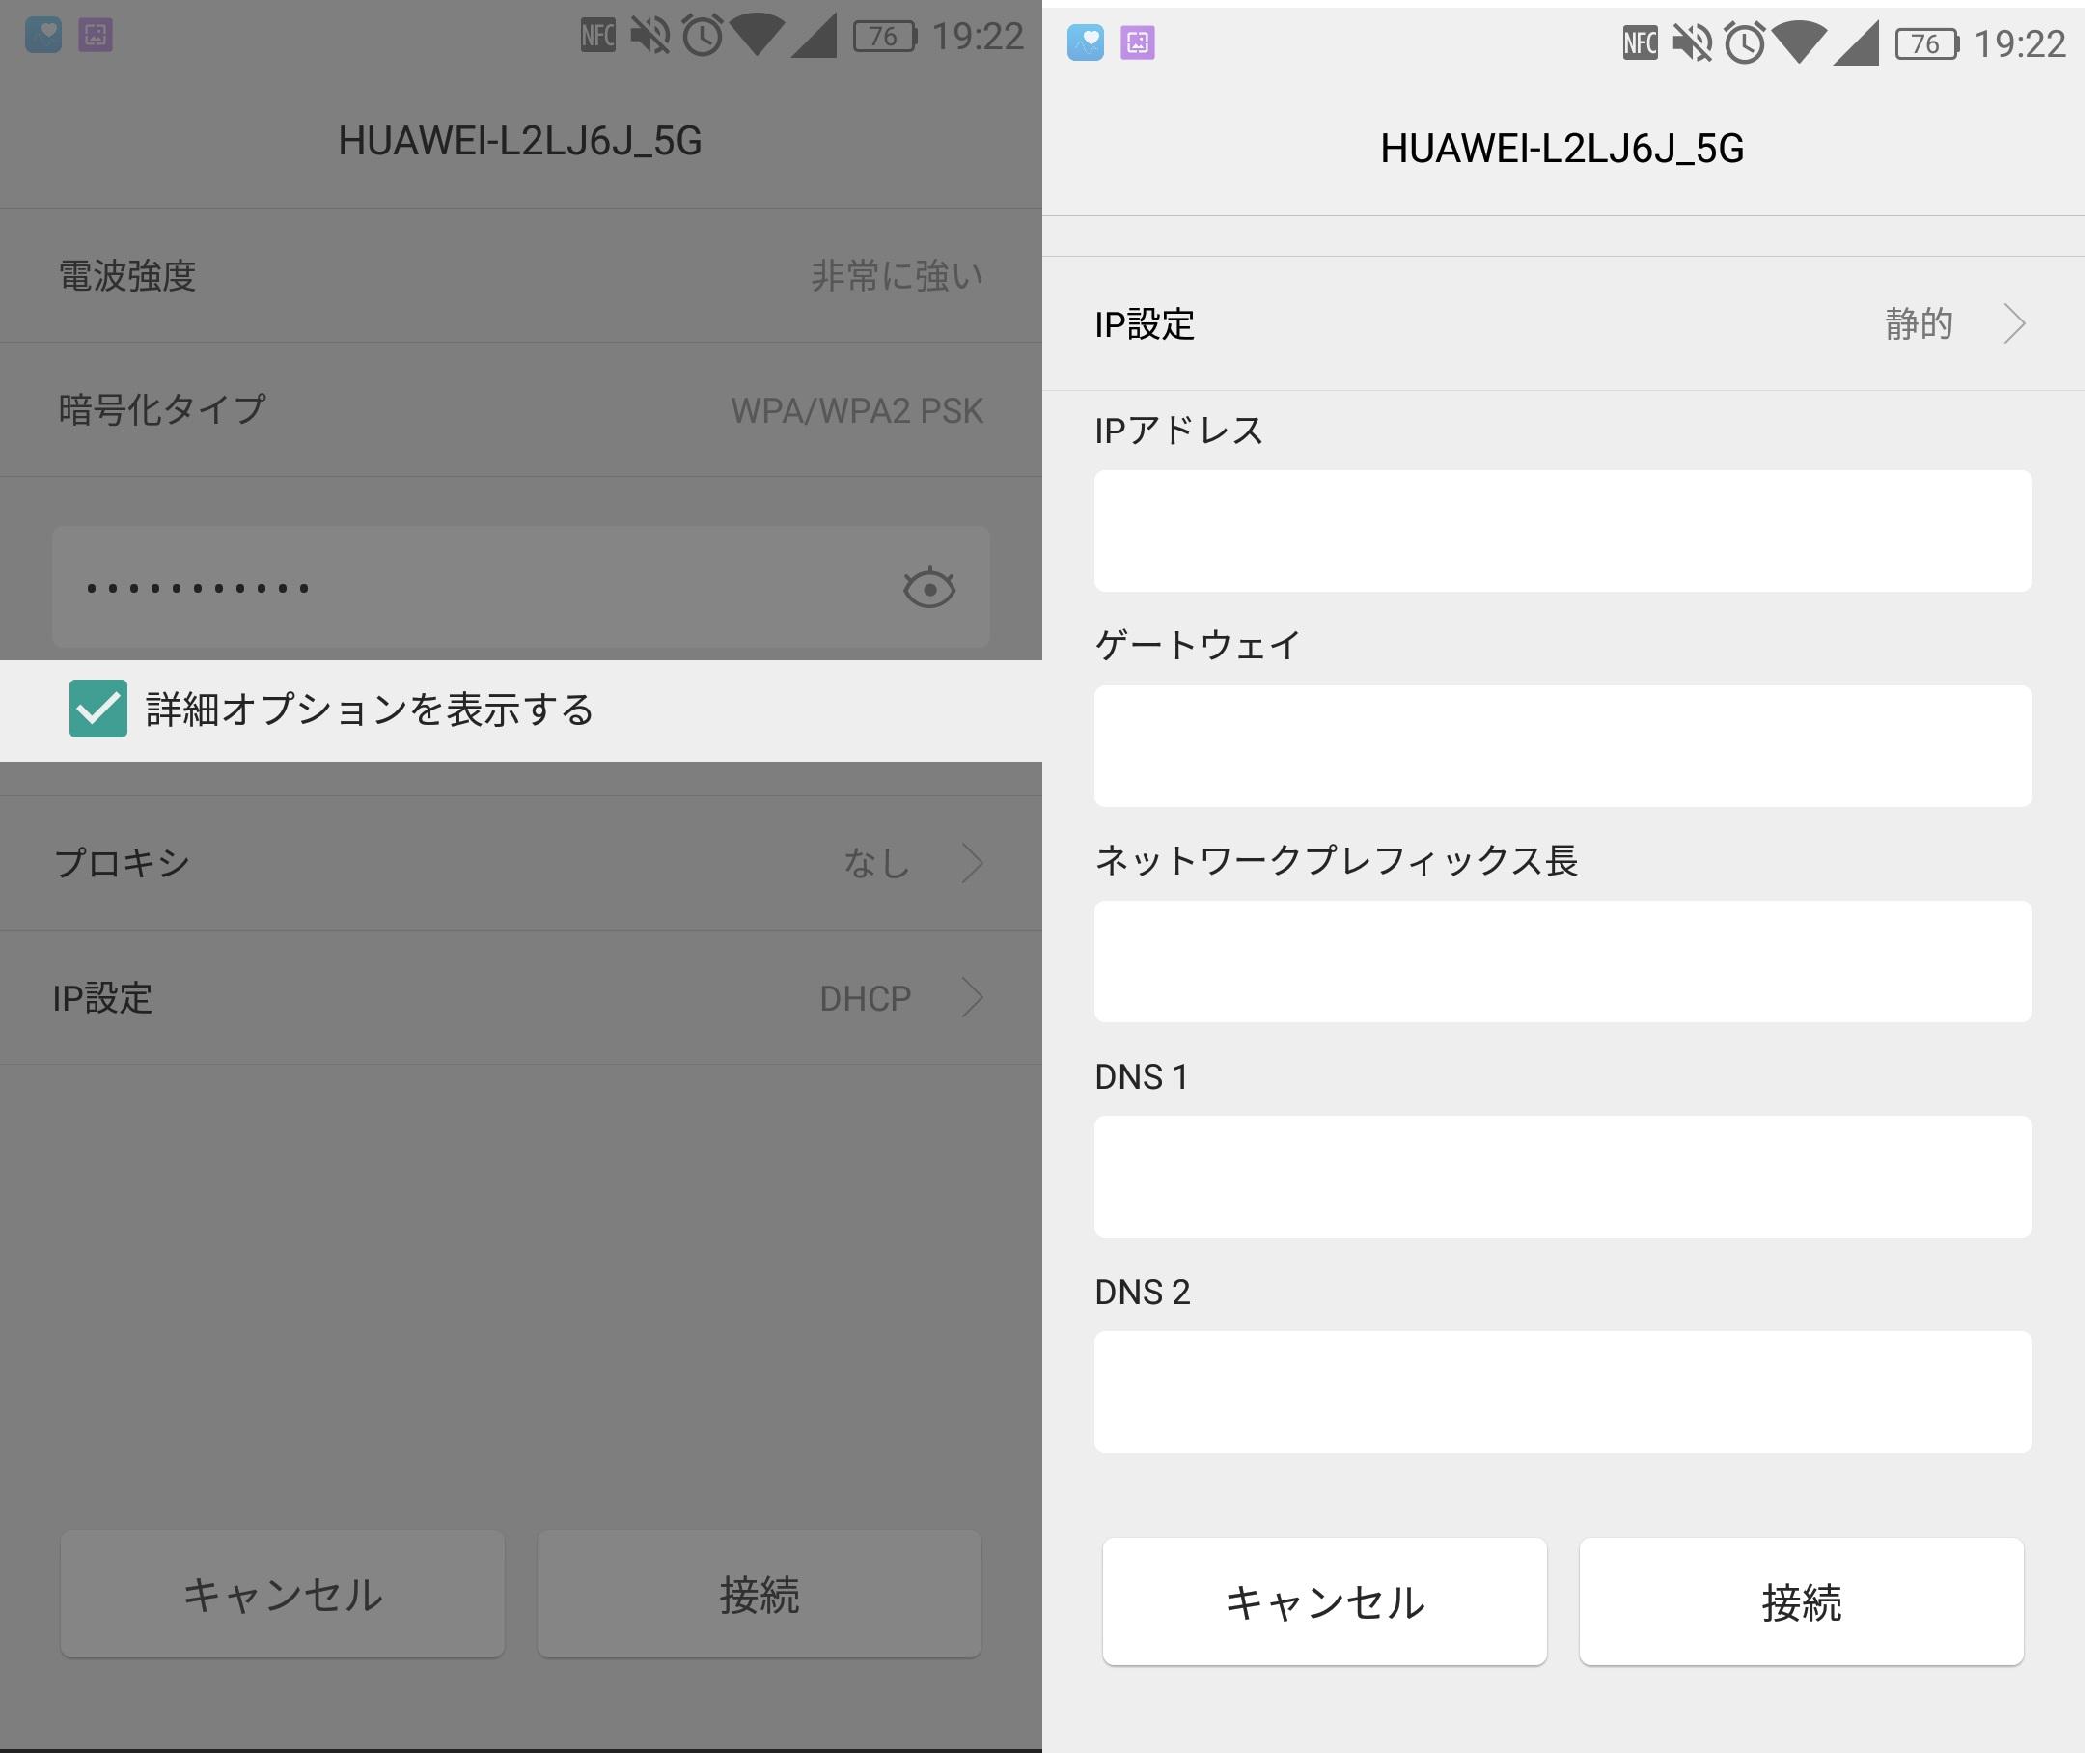 Huawei P9における 5.0GHz帯のWi-Fi接続を改善する対策の紹介